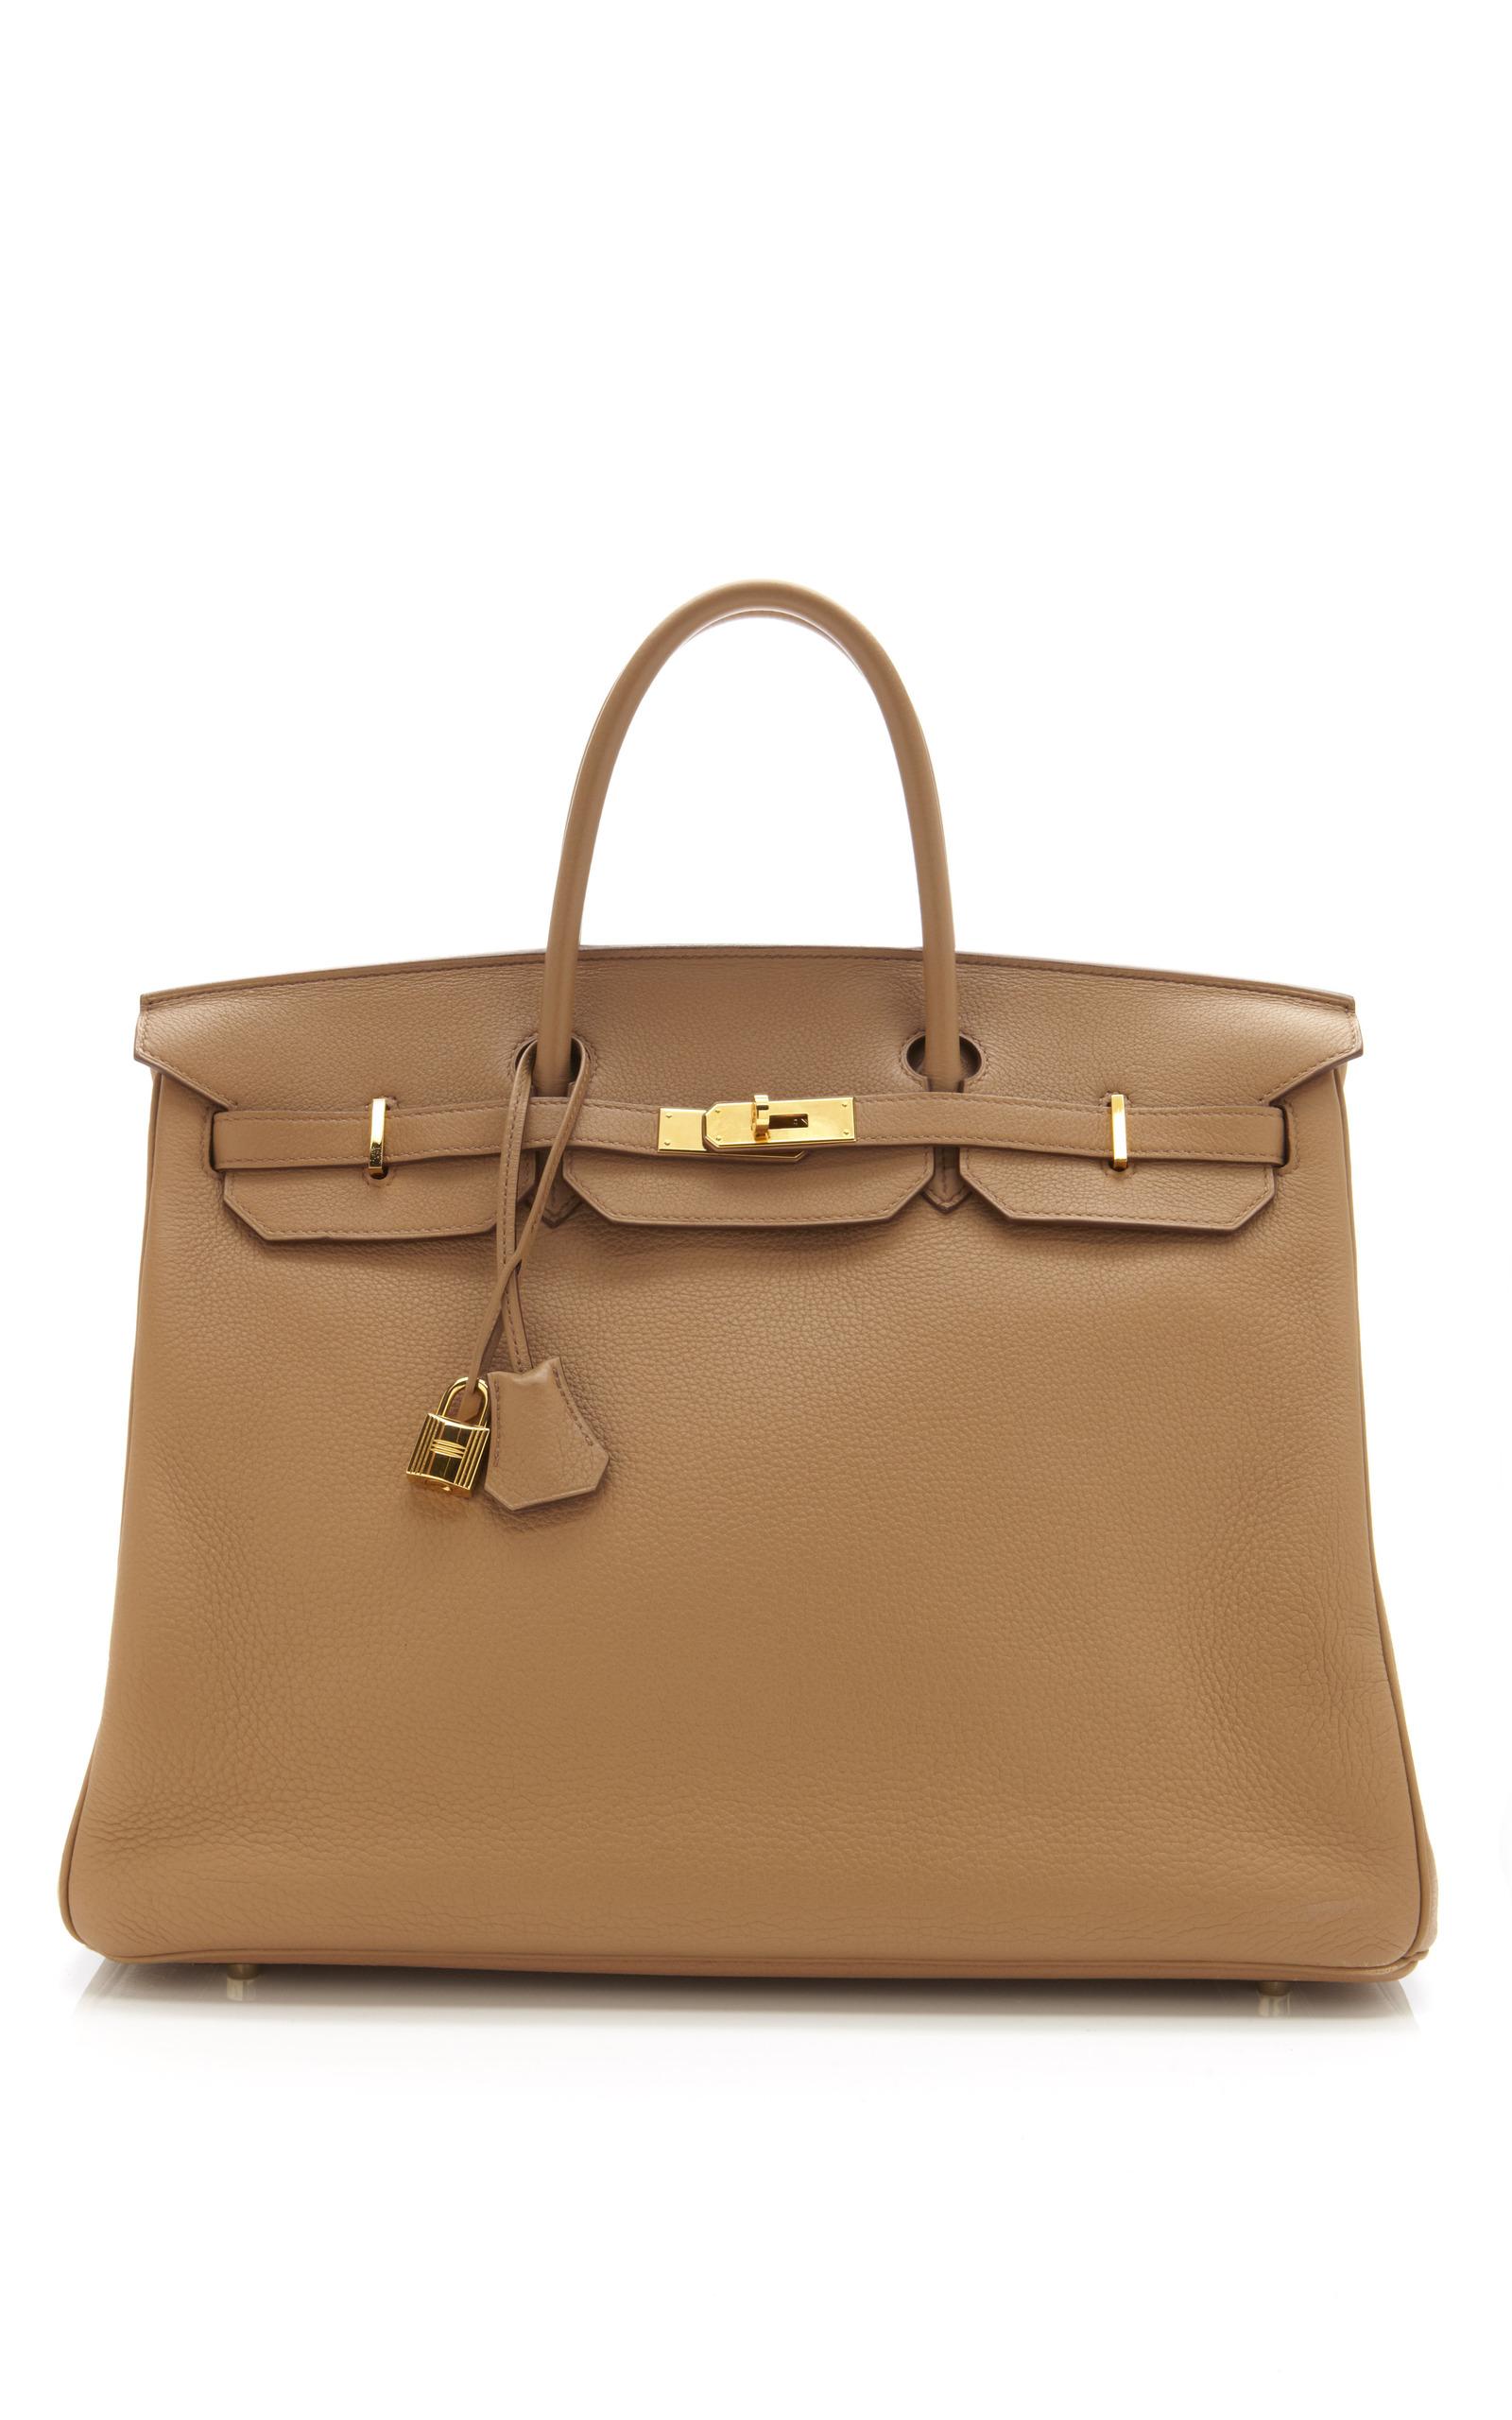 4f2bae5dce Hermes Vintage40cm Tabac Camel Clemence Leather Birkin. CLOSE. Loading